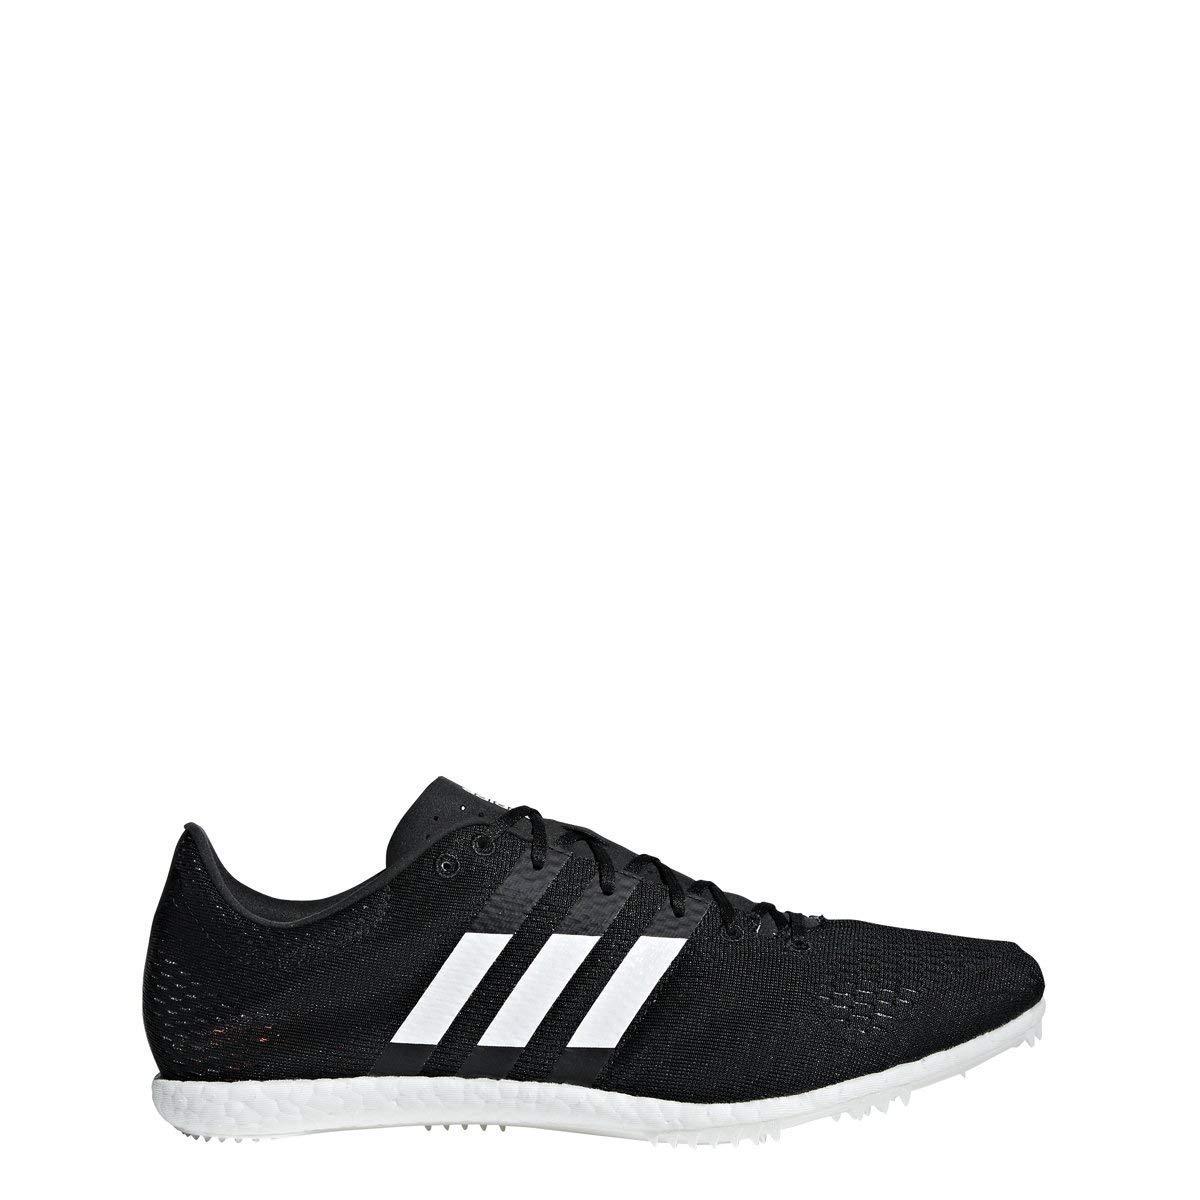 adidas Adizero Avanti Spike Shoe - Unisex Track